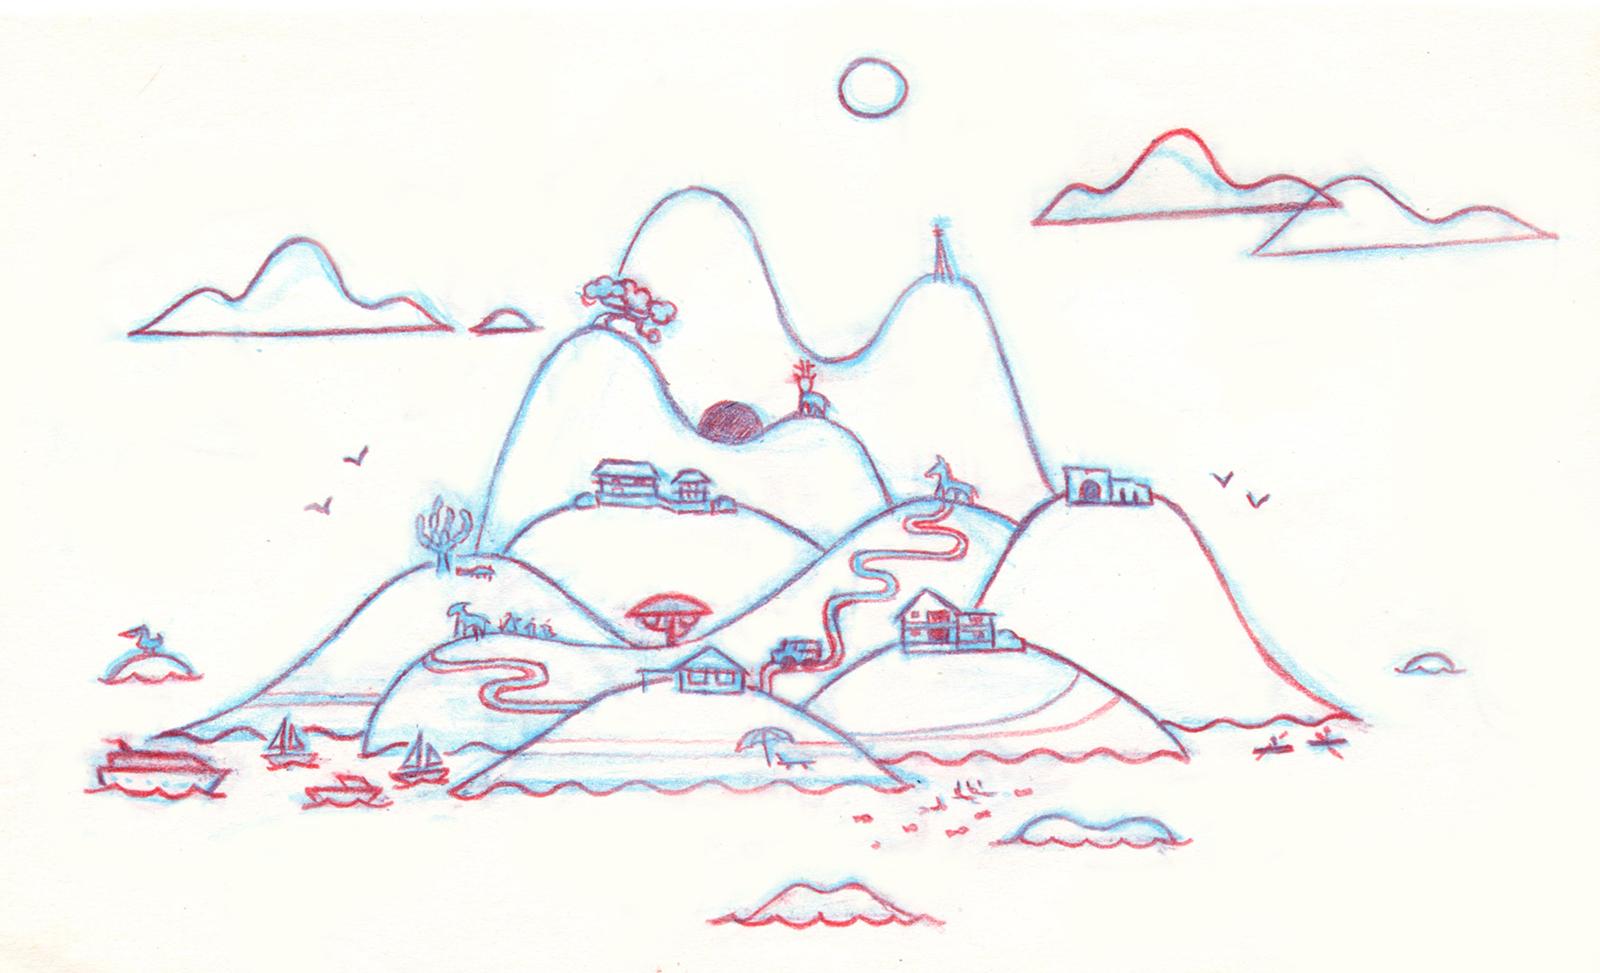 st-john-usvi-sketch-02.jpg